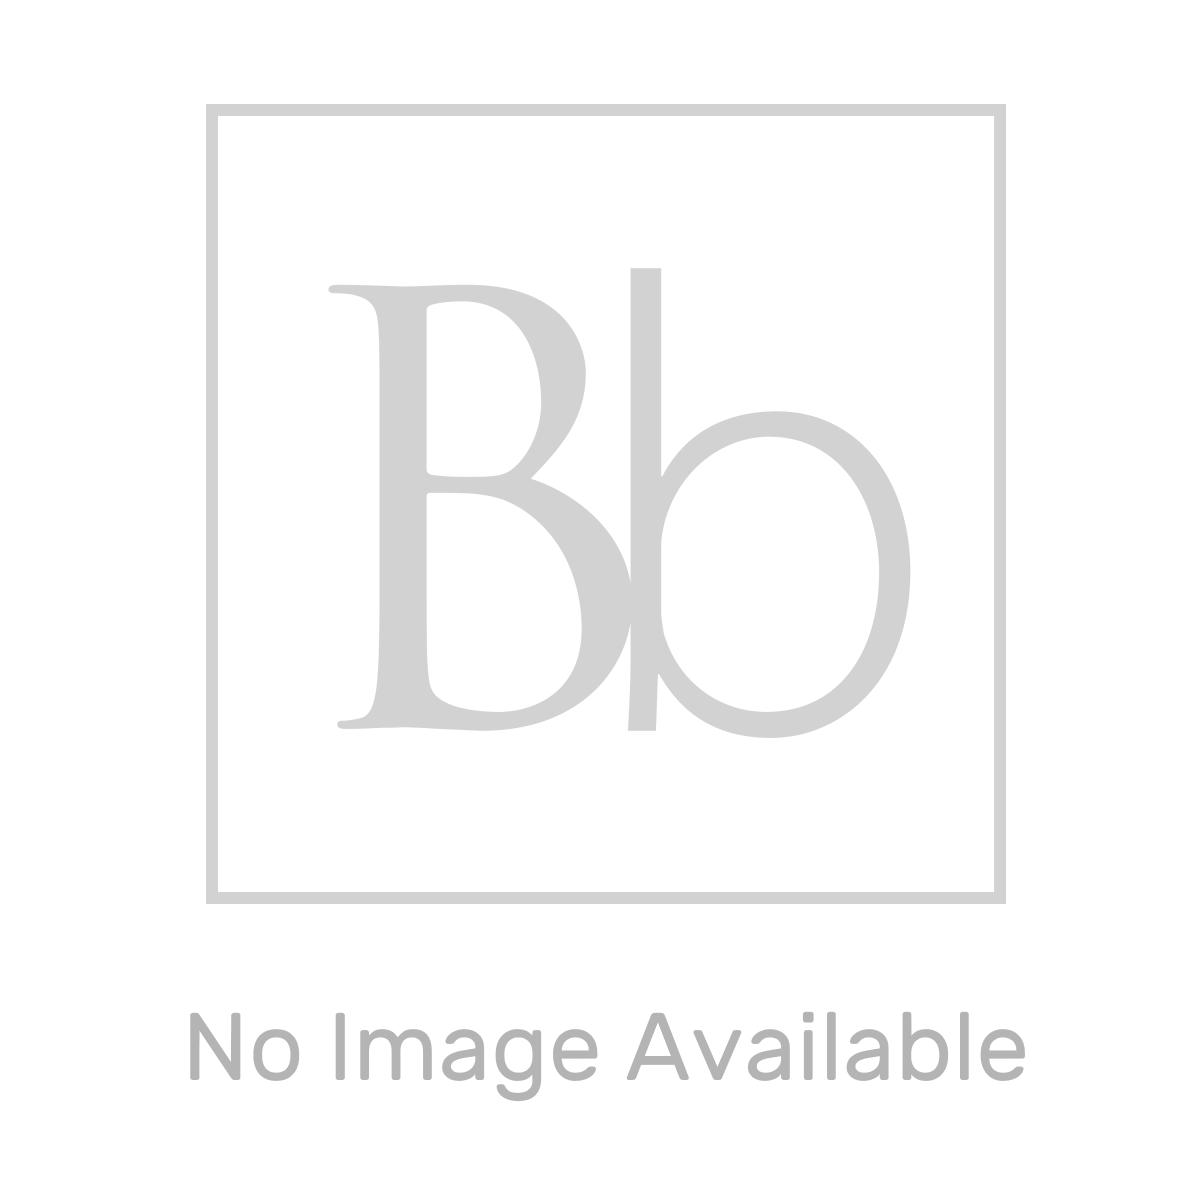 RAK Compact Shower Suite with Pacific Sliding Door Shower Enclosure Recess